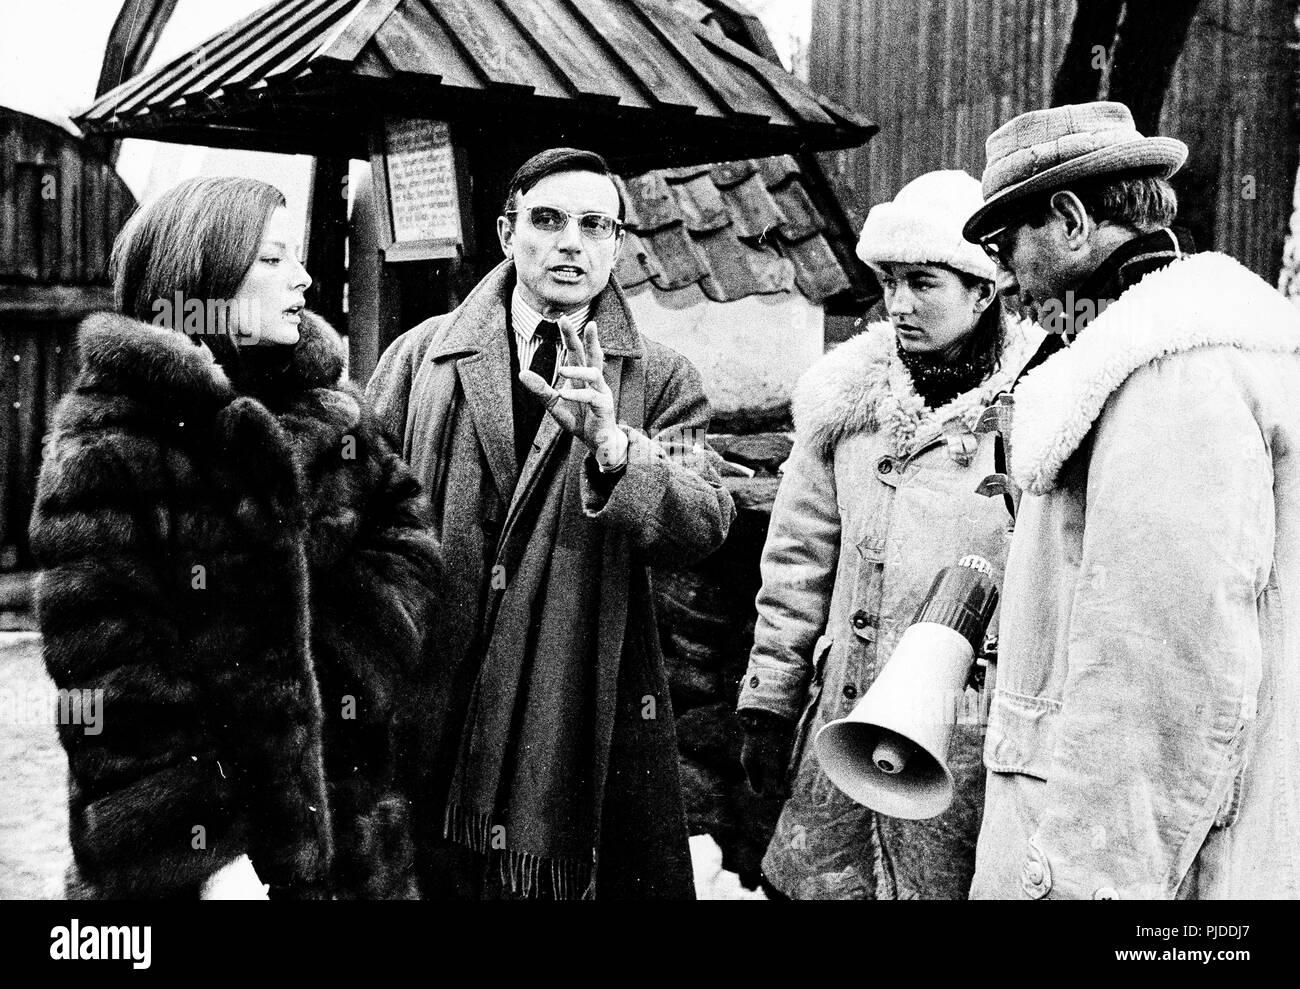 virna lisi, franco brusati on set of the movie tenderly, sweden 1968 - Stock Image